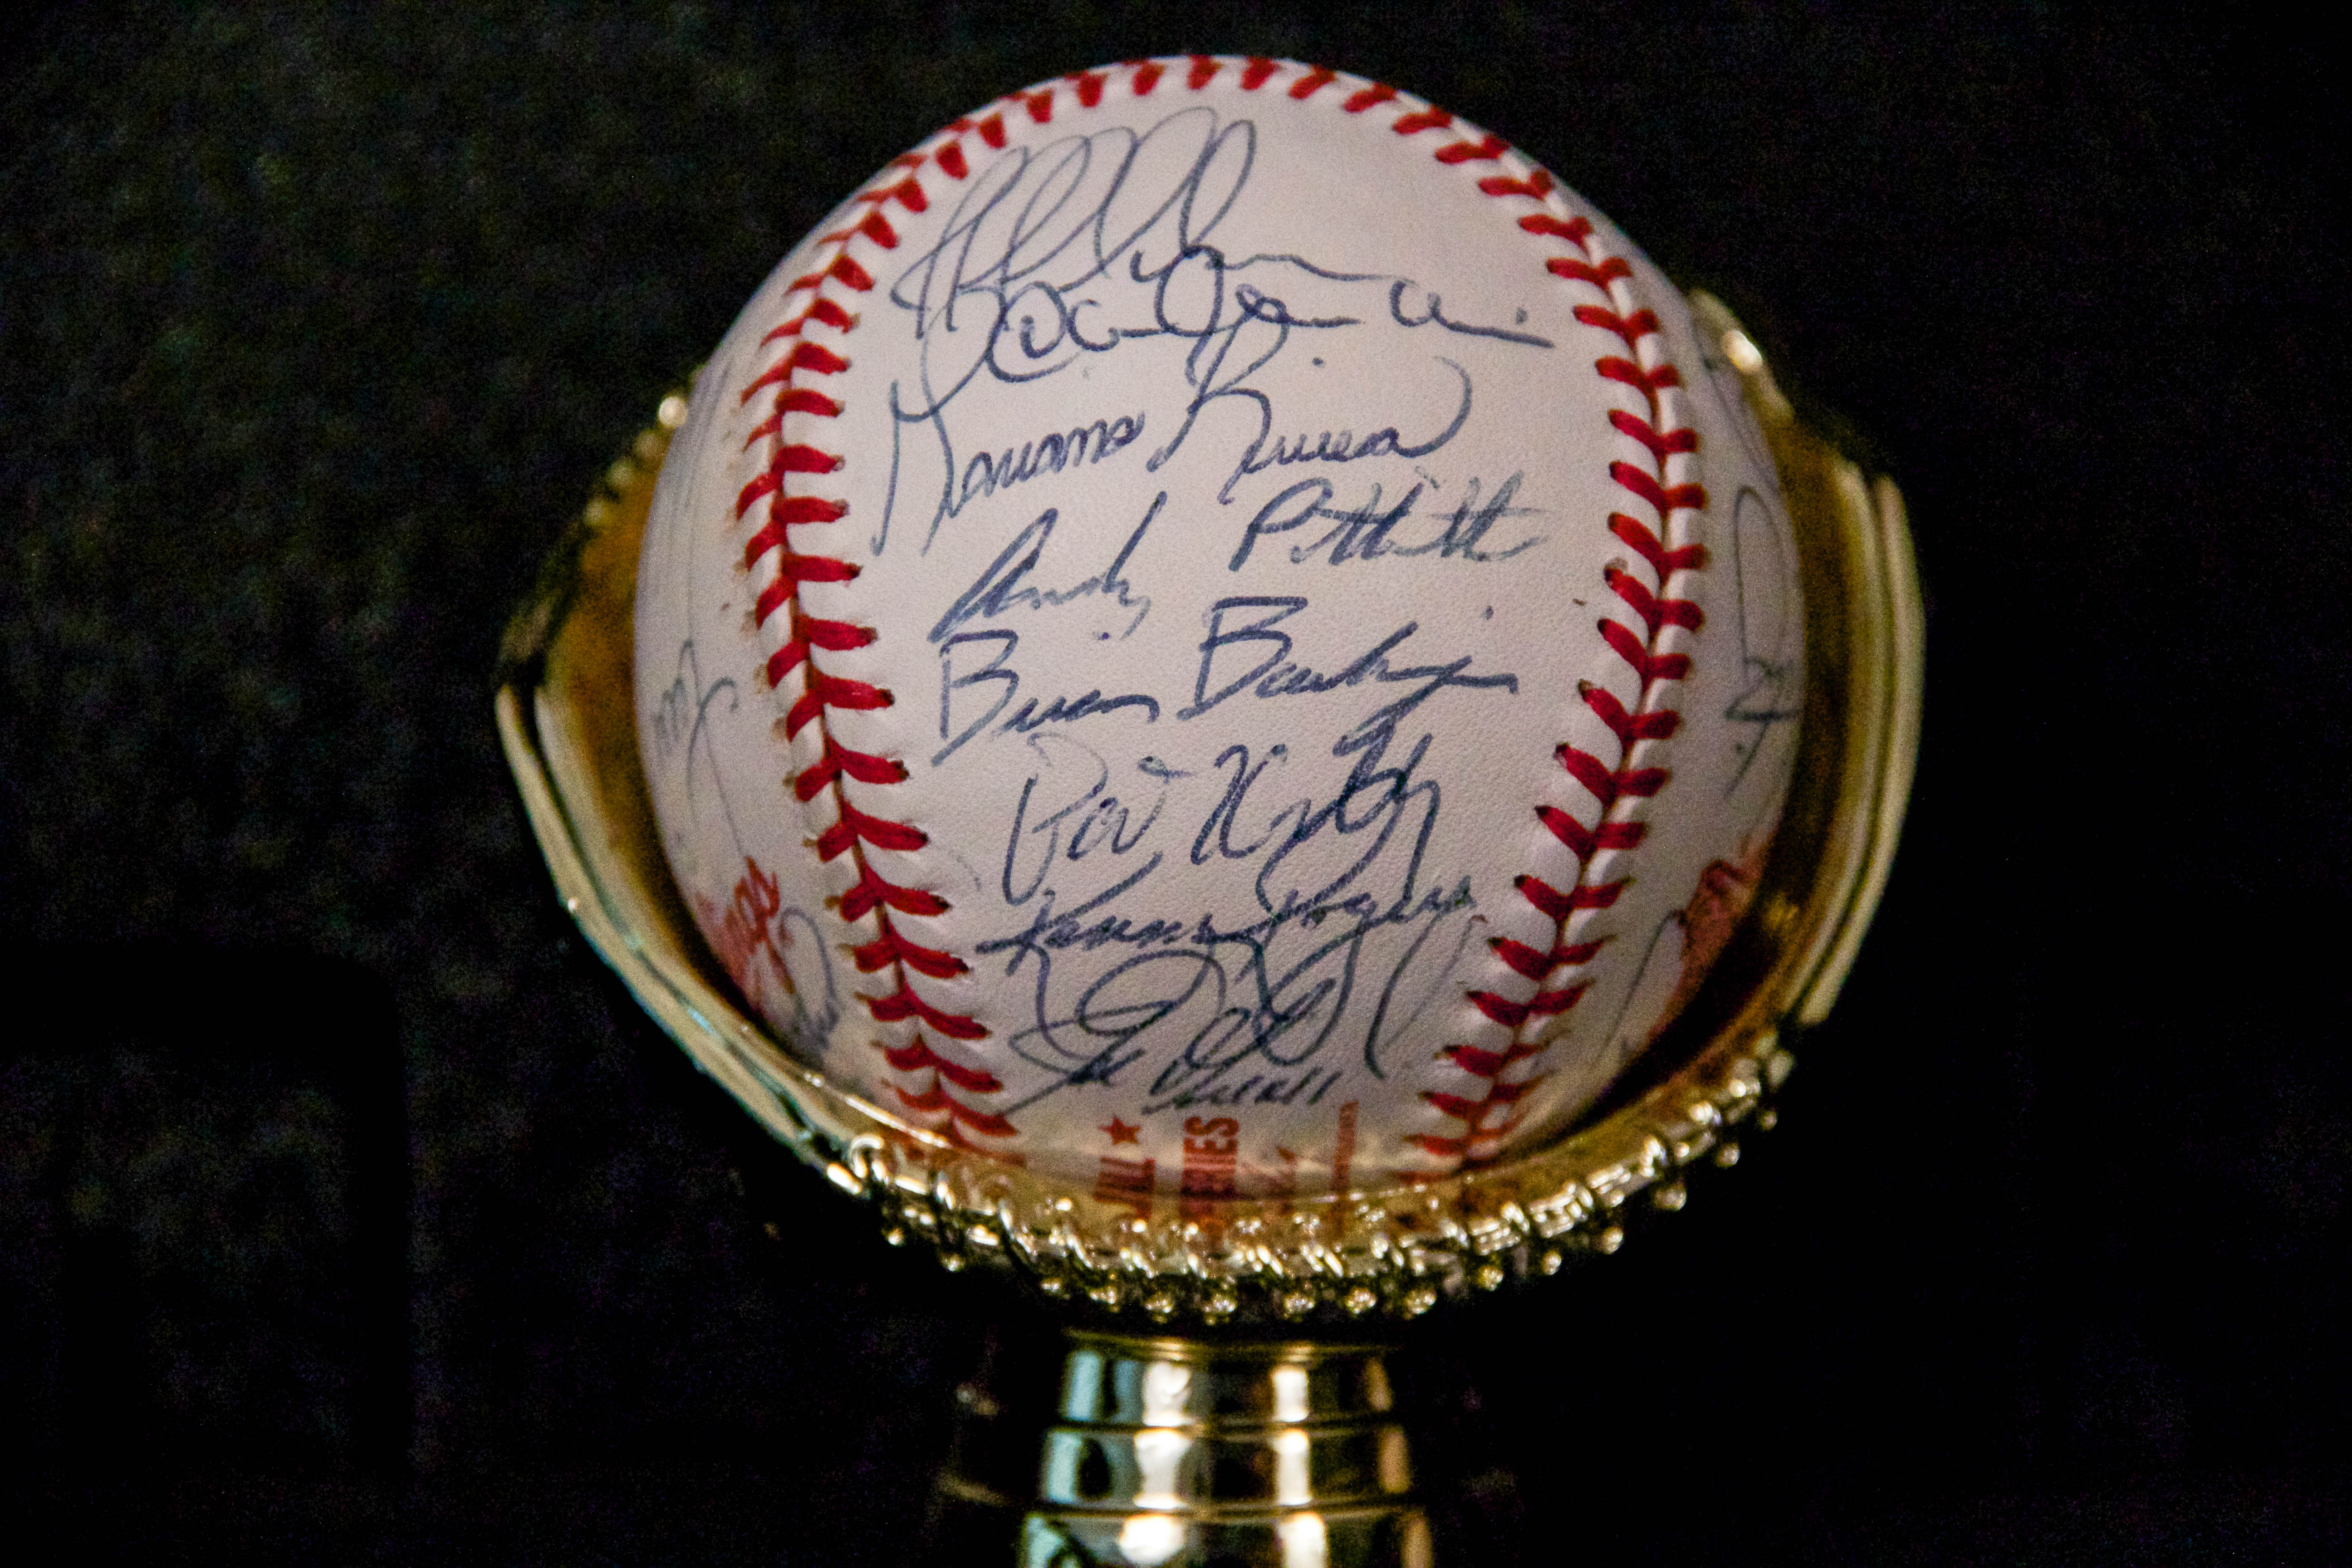 1996 World Series Champions